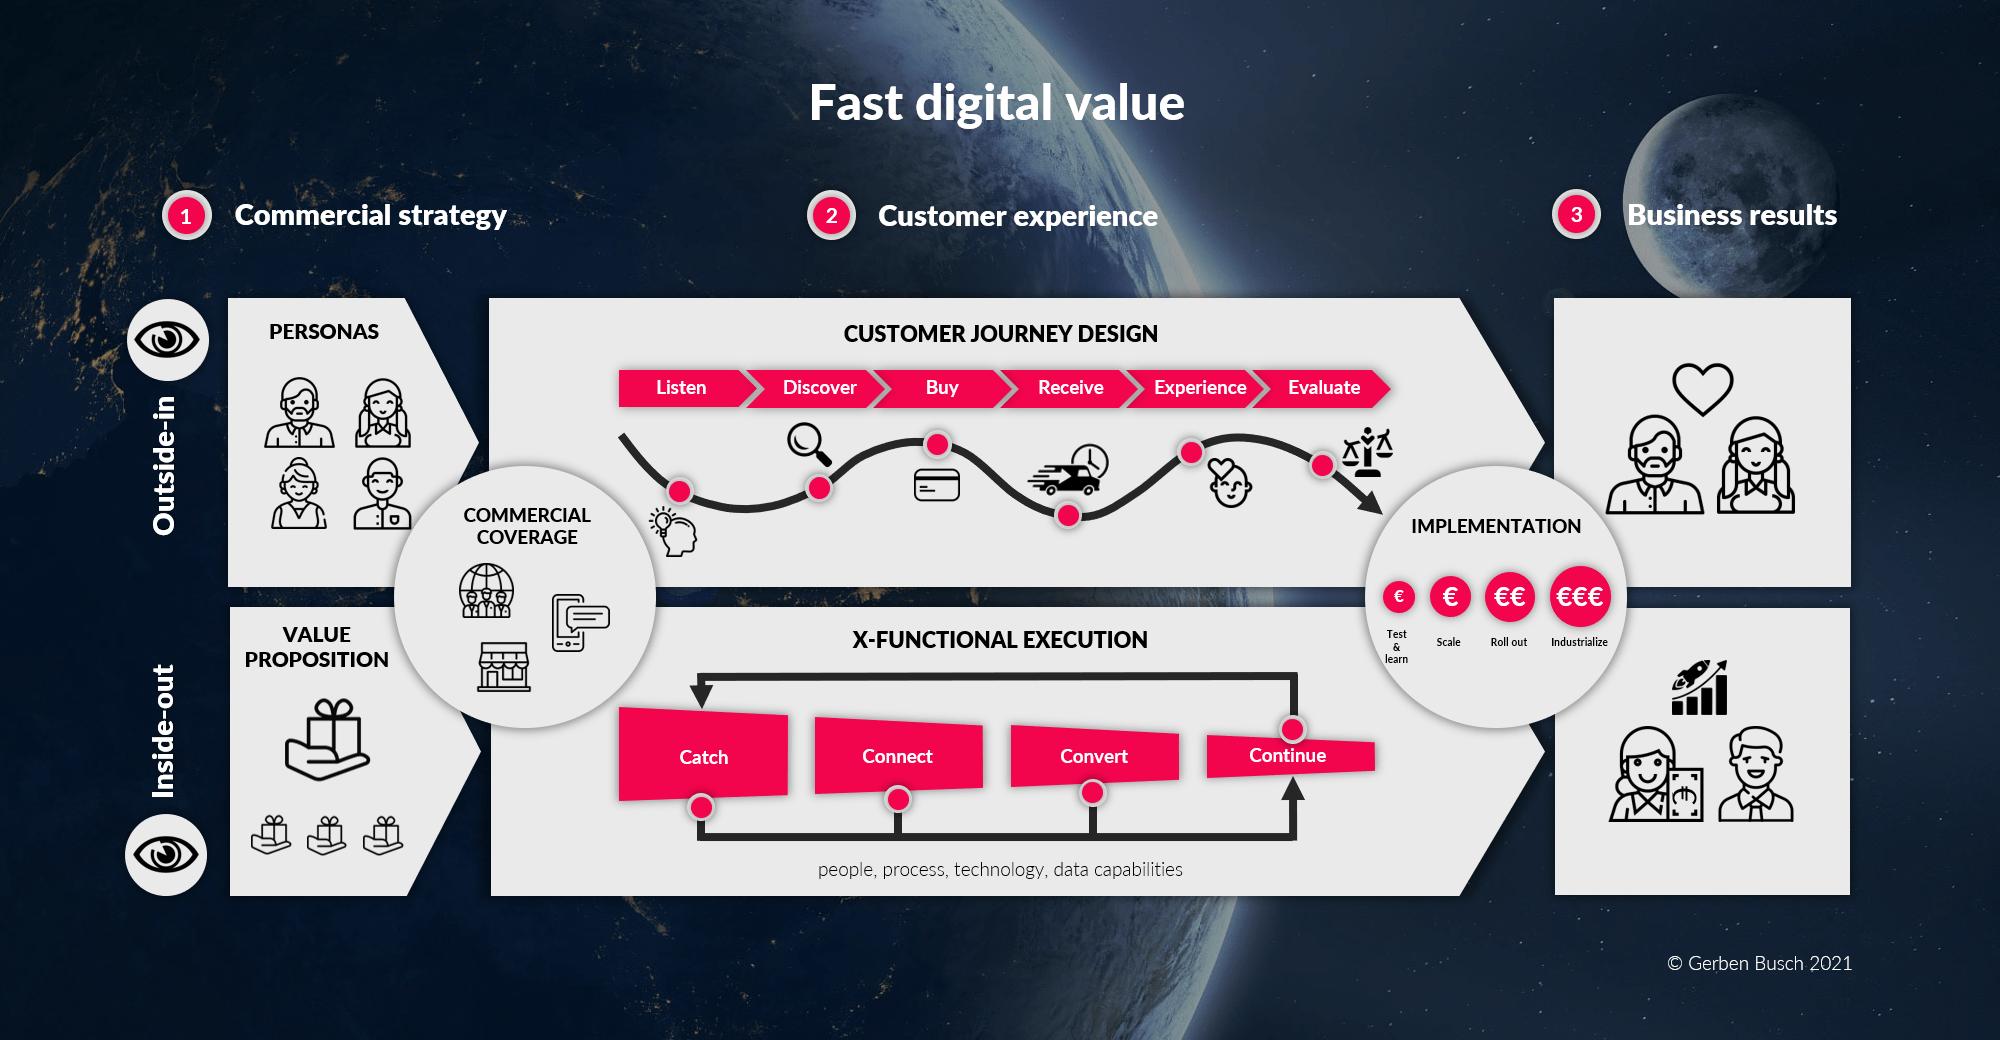 Fast digital value digital transformation customer experience e-commerce CRM loyalty marketing automation